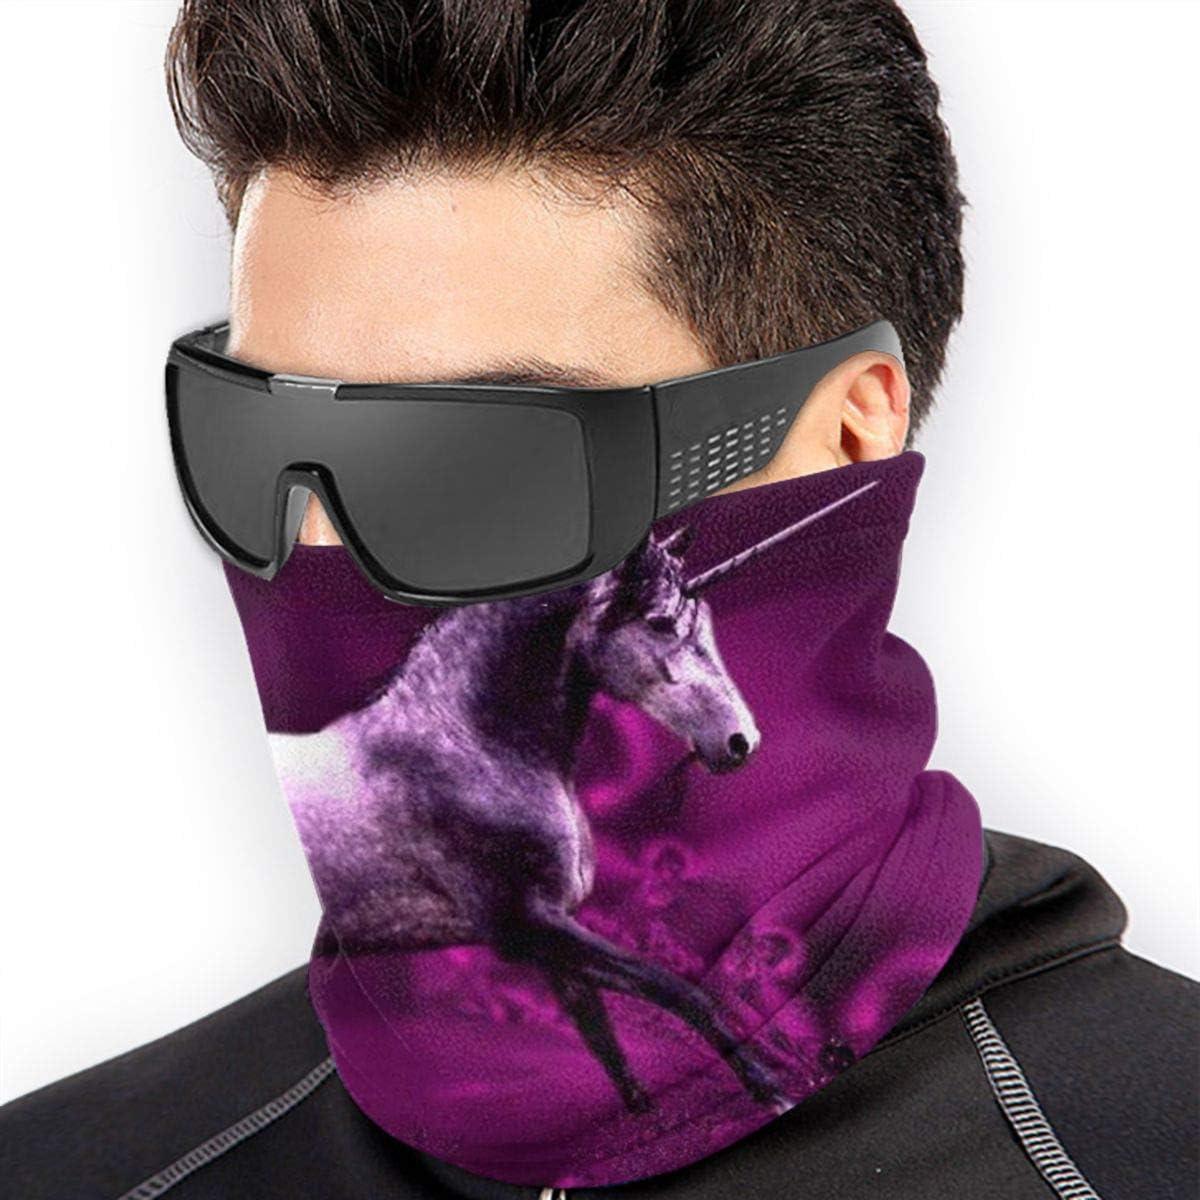 Beautiful Purple Unicorn Neck Gaiter Headwear Headband Head Wrap Scarf Mask Neck/Ear Warmers Headbands Perfect For Winter Fishing, Hiking, Running, Motorcycle Etc& Daily Wear For Men And Women